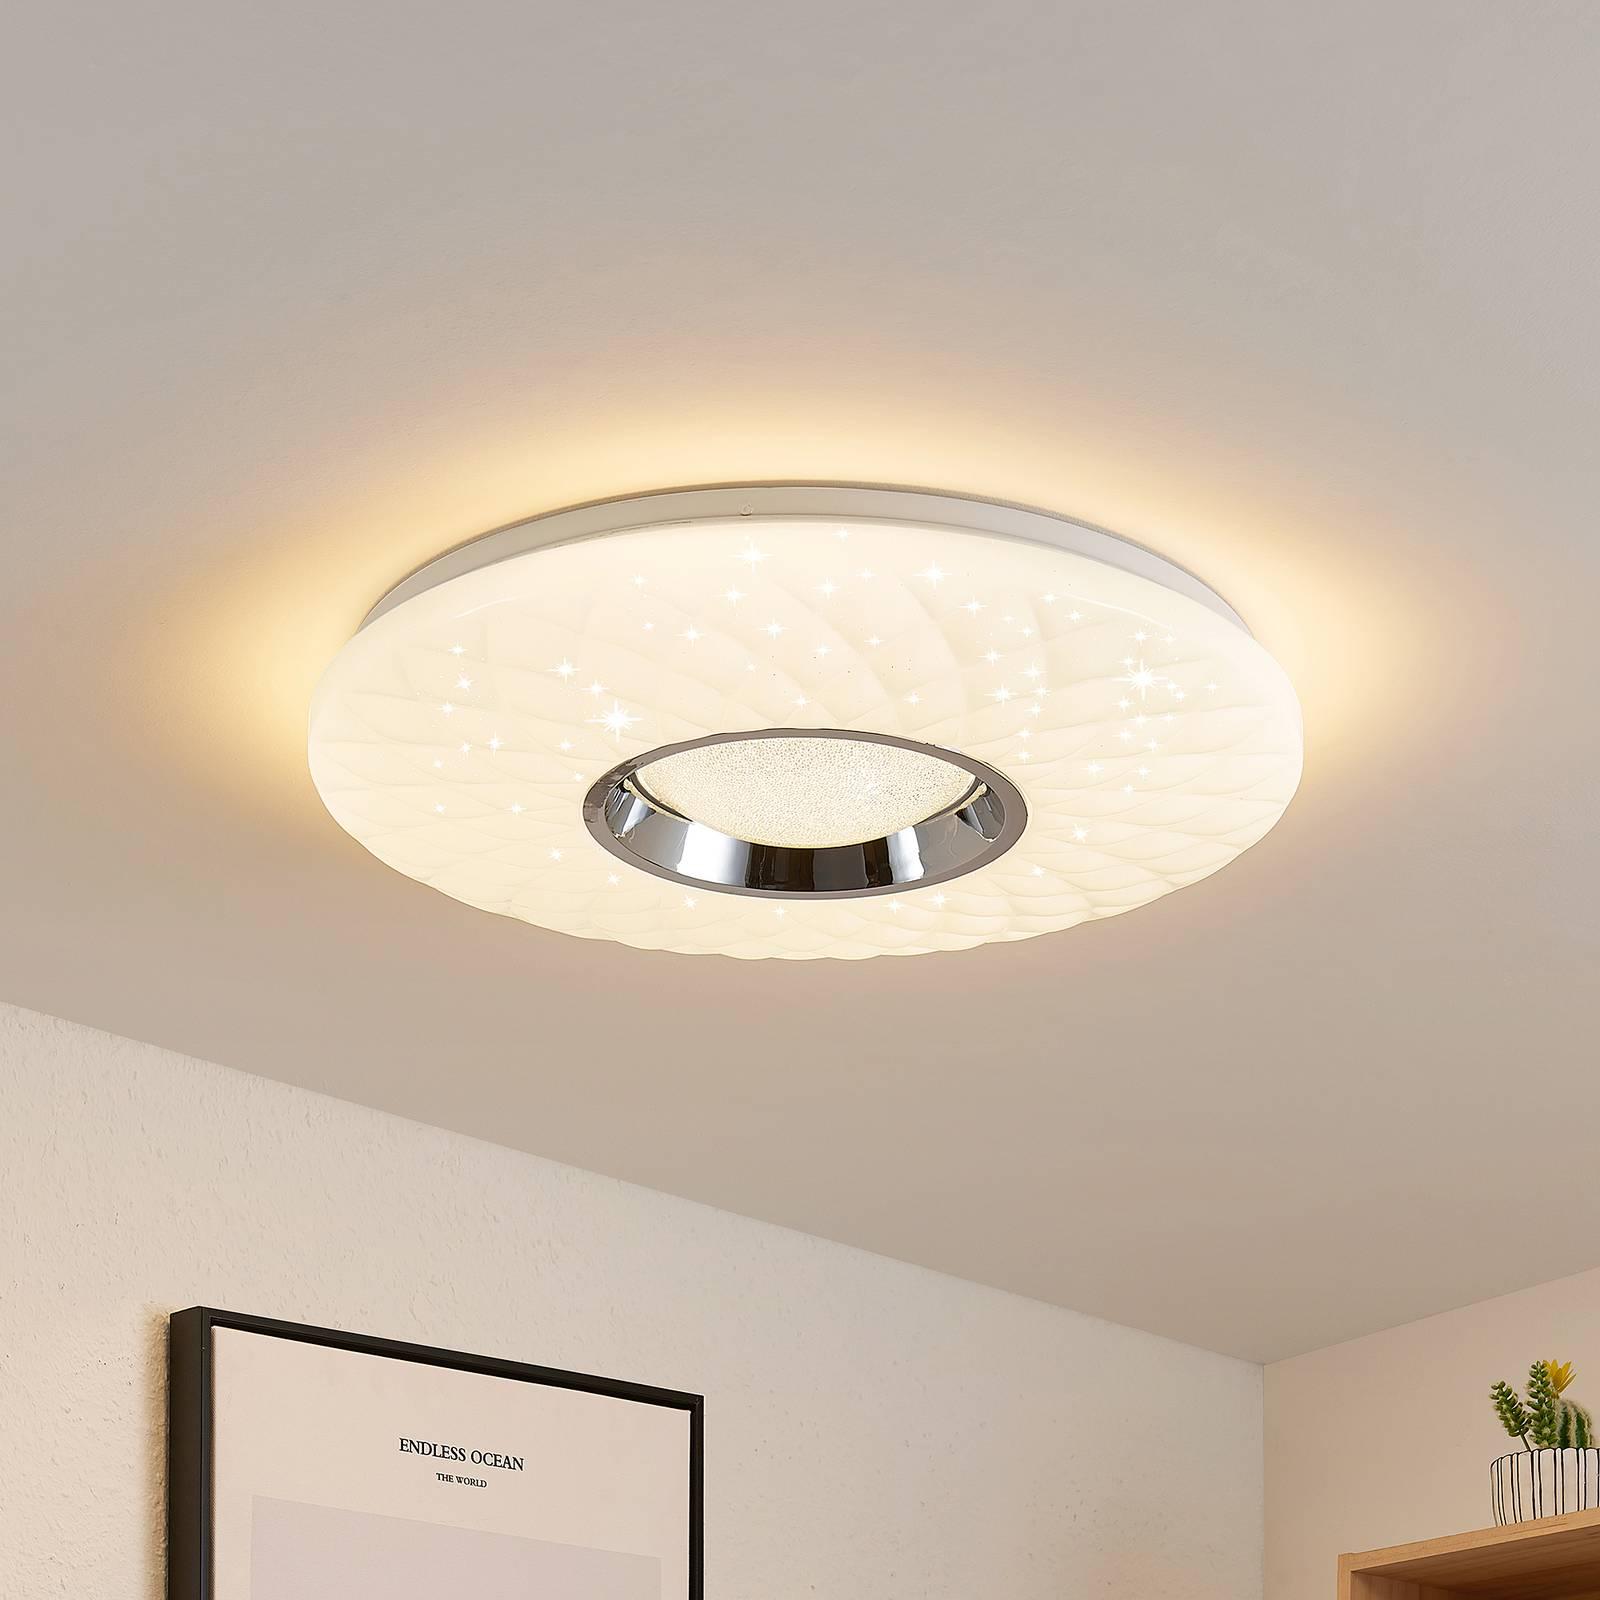 Lindby Illaria LED plafondlamp, RGBW, CCT, 49 cm